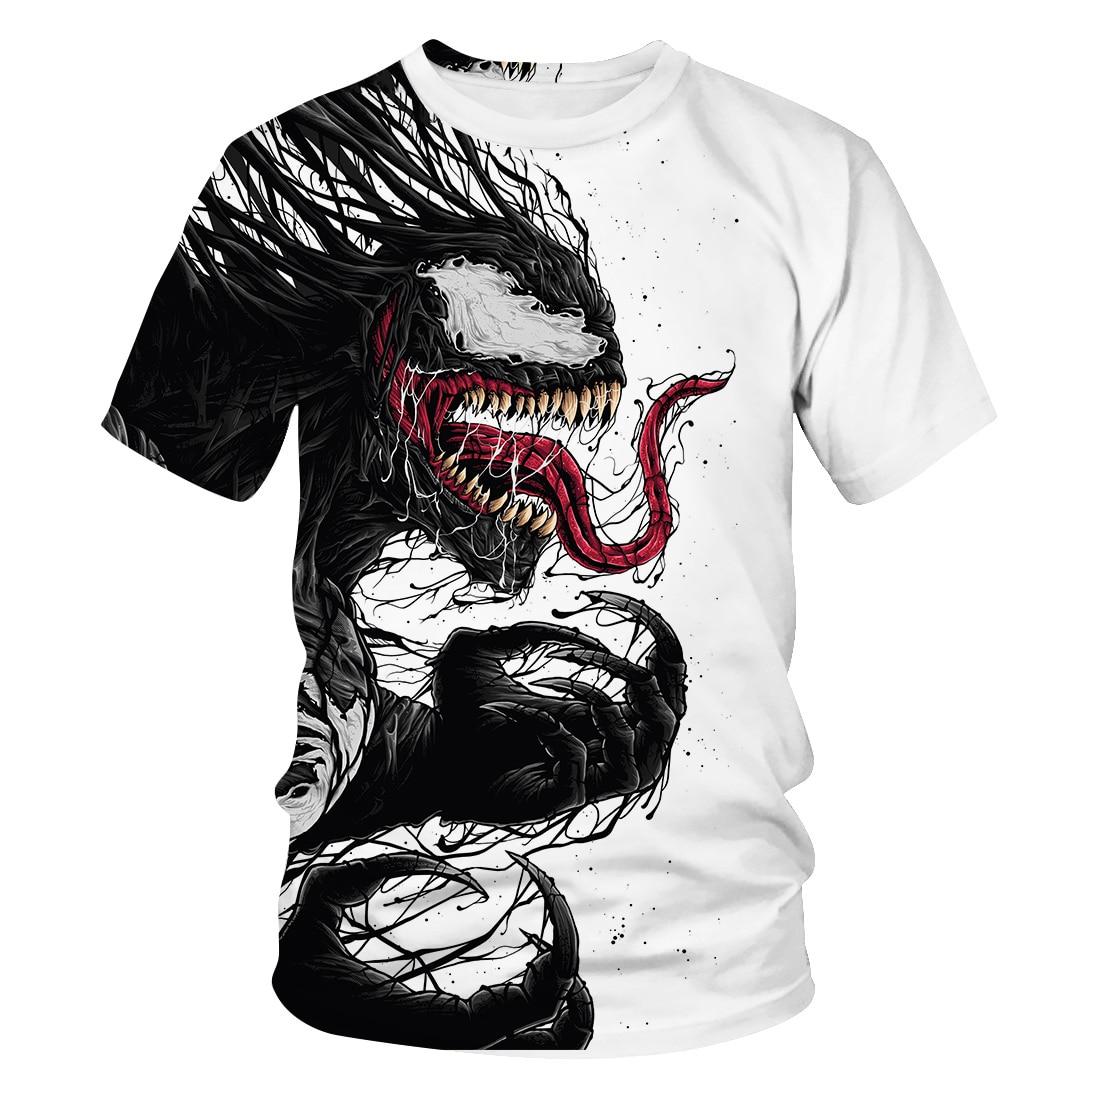 3 To 14 Years Kids T Shirt Movie Venom 3D Printed Tshirt T-shirt Boys Girls Short Sleeve Cartoon T Shirts Tops Children Clothes